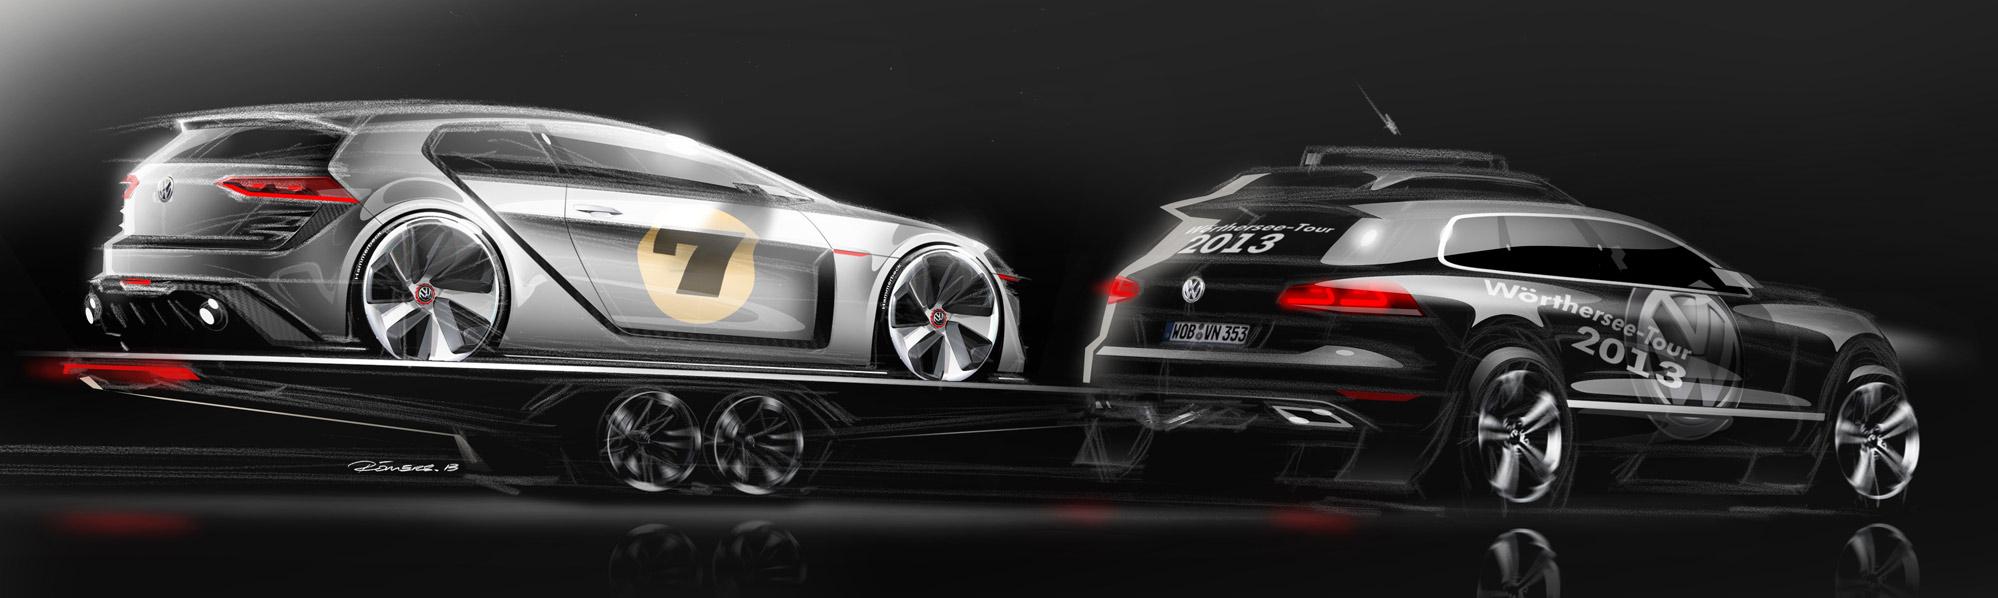 volkswagen-design-vision-gti-3